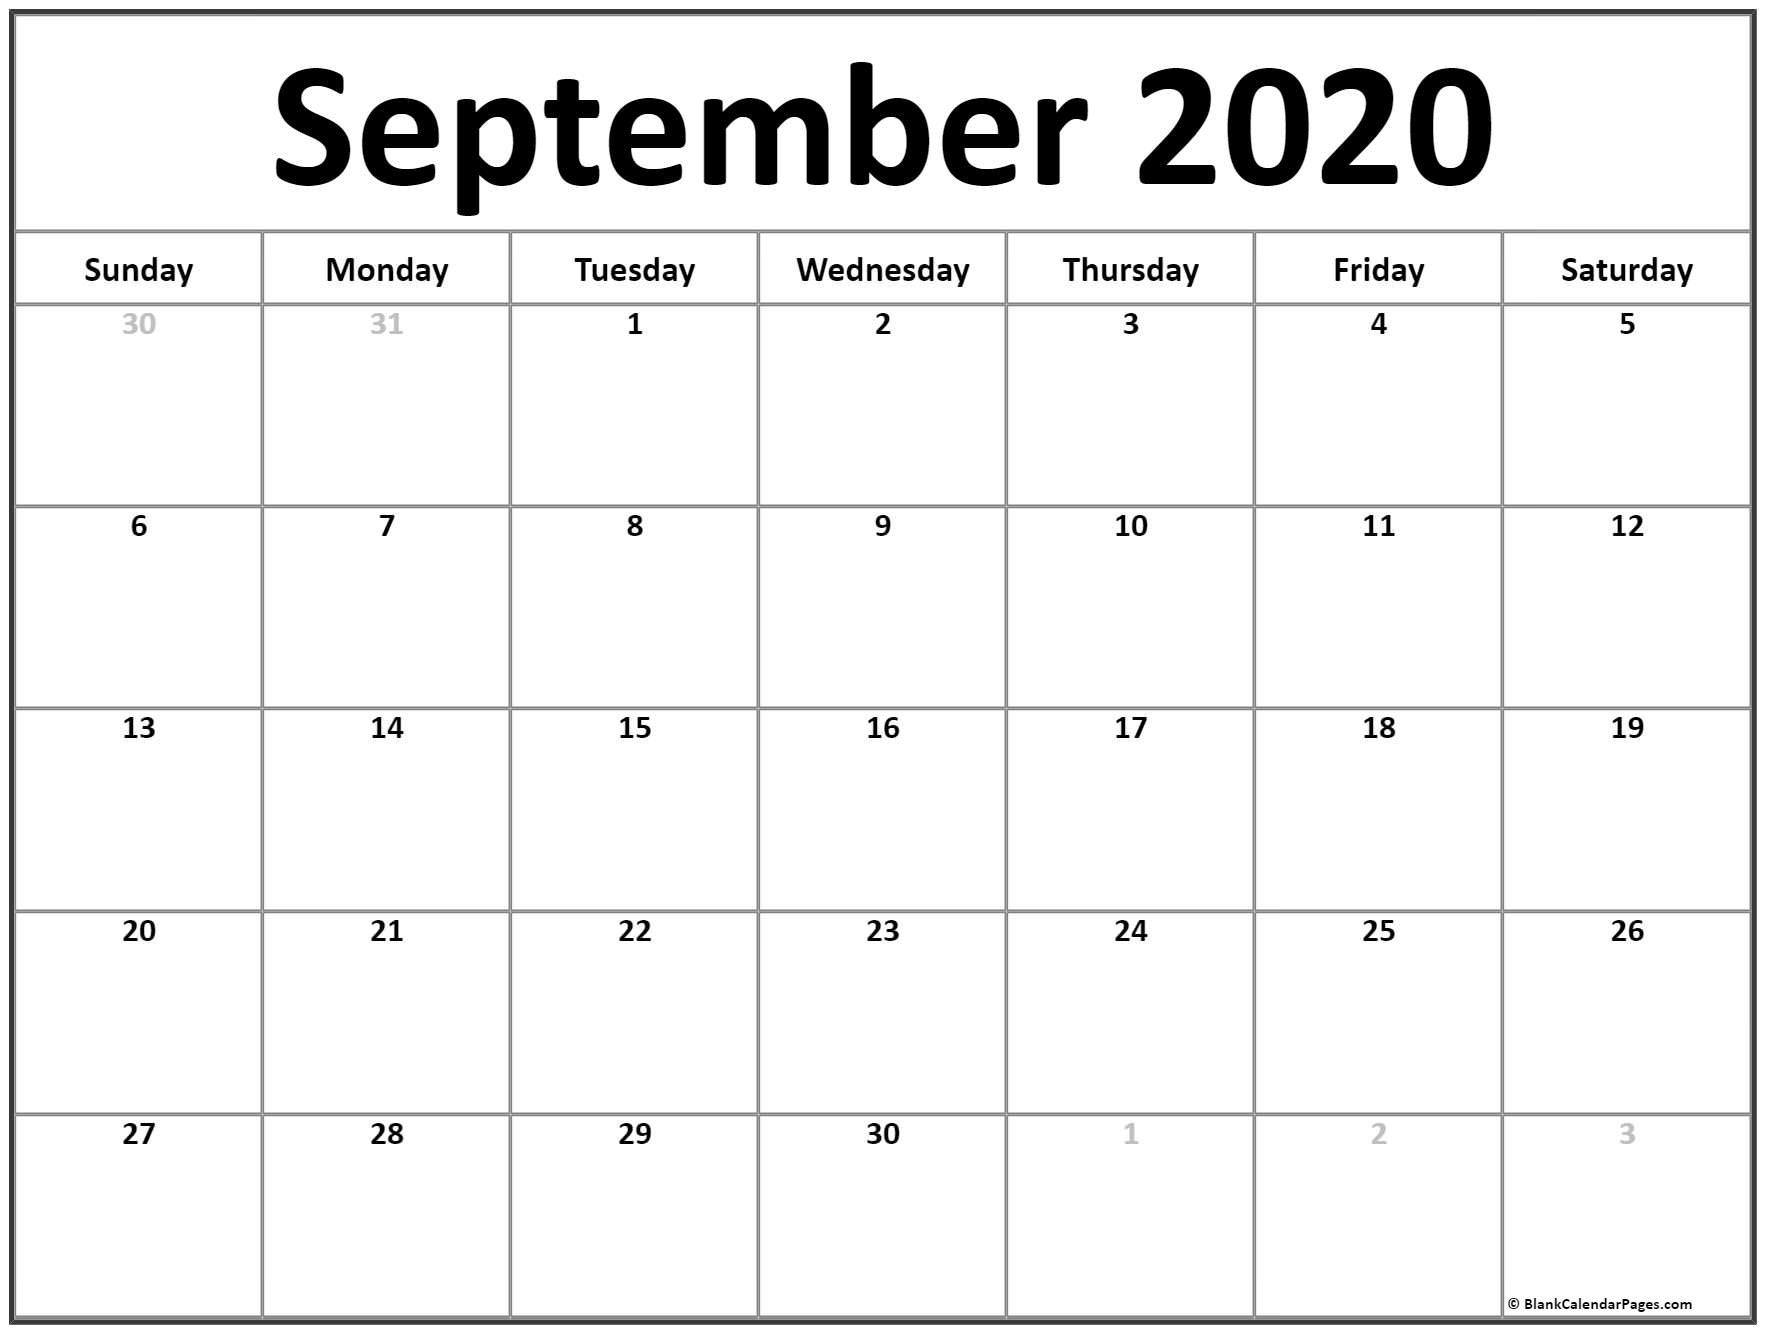 September 2020 Calendar Printable | February Calendar